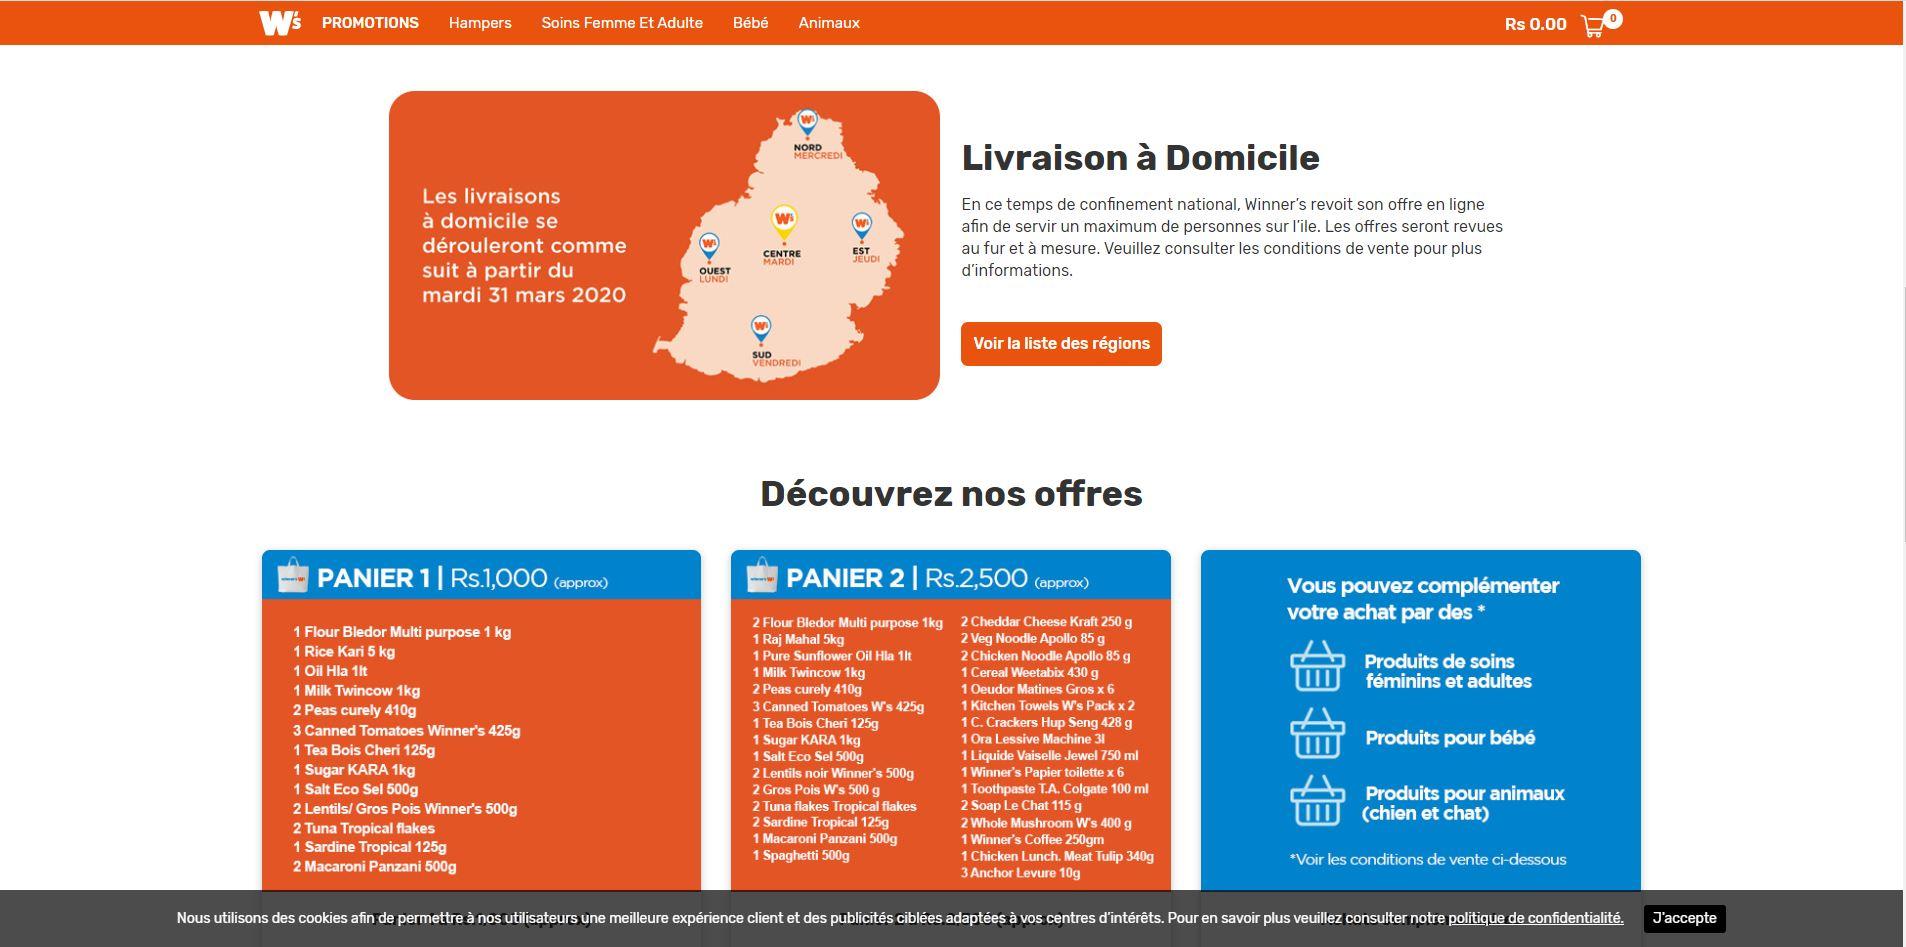 Winners-mu-digital-marketing-mauritius-ecommerce